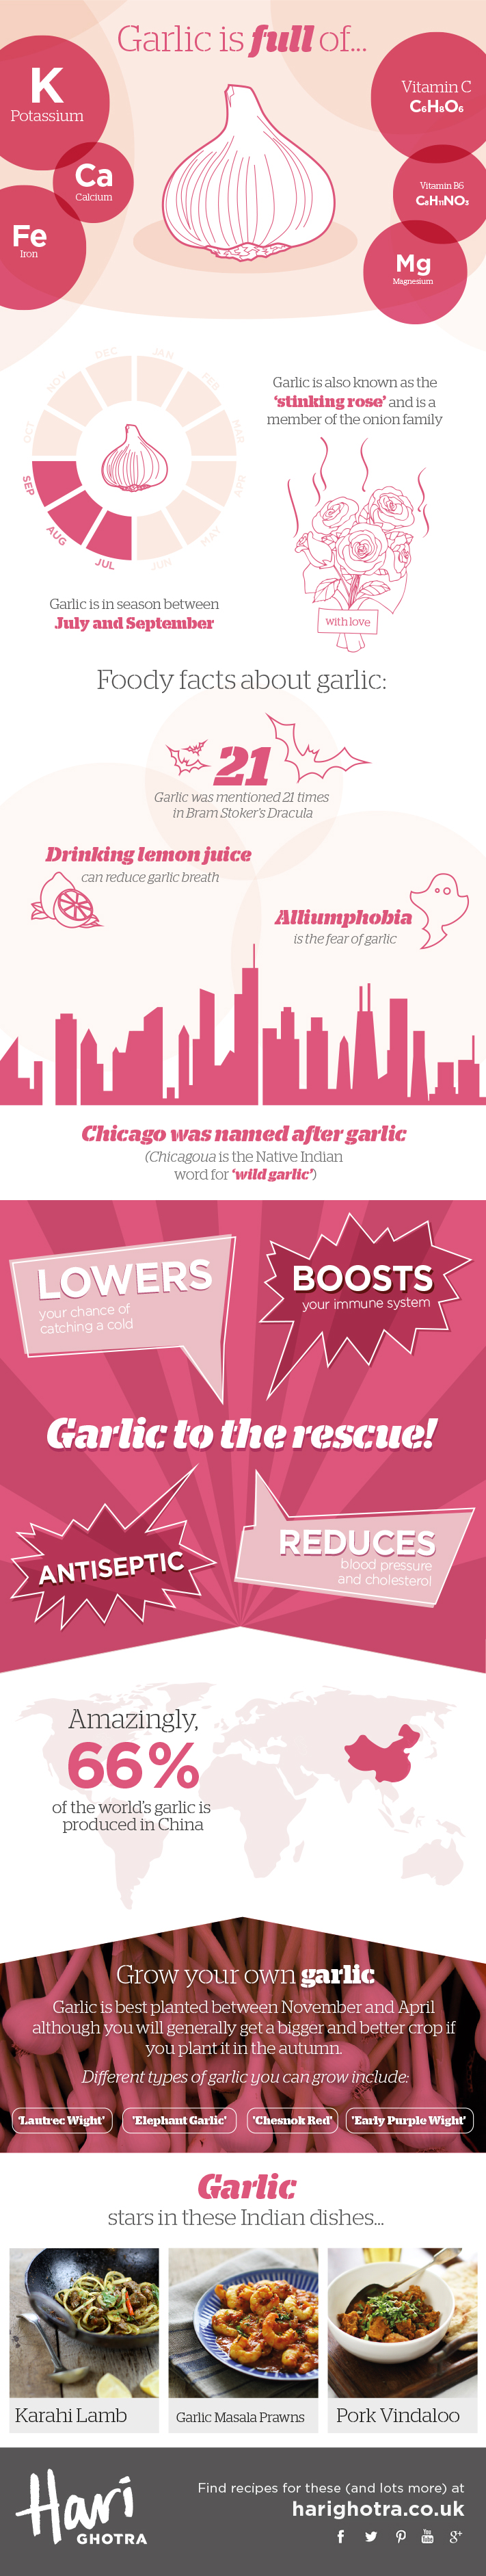 Chef Hari Ghotra's Key Ingredients Garlic Infographic